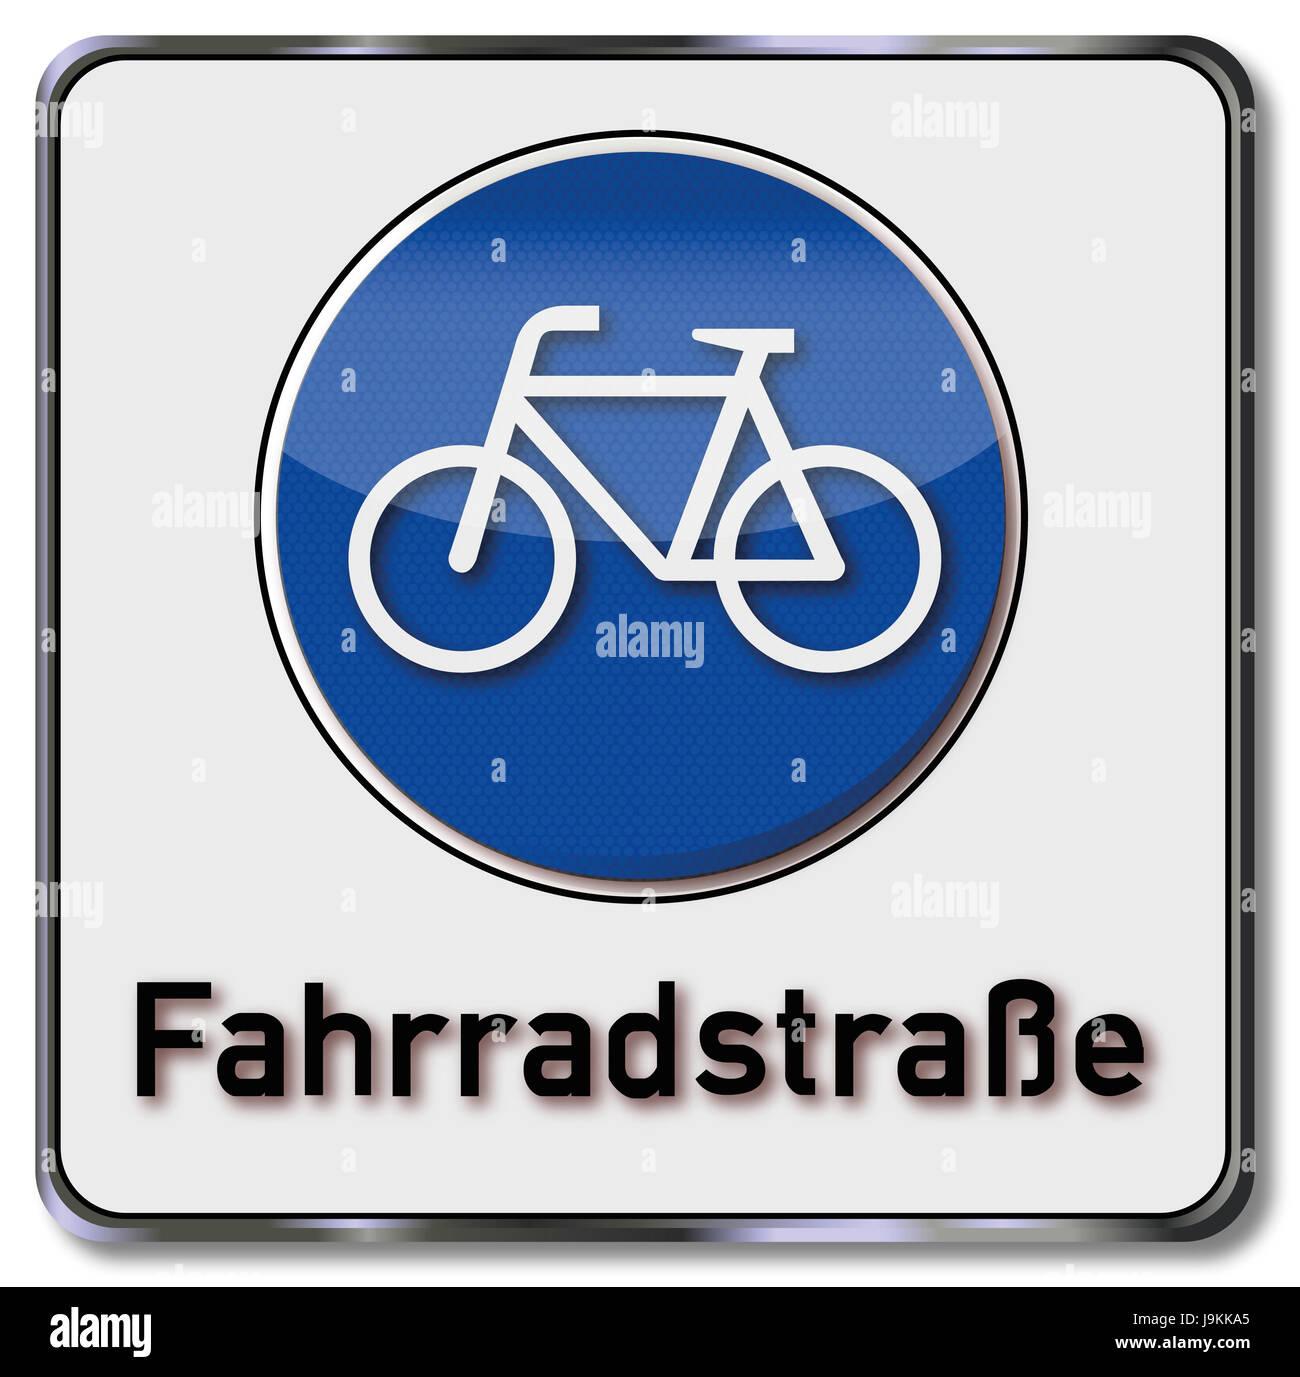 wheel, biker, ecology, zone, muscularity, bike, bicycle, cycle, danger, risk, Stock Photo